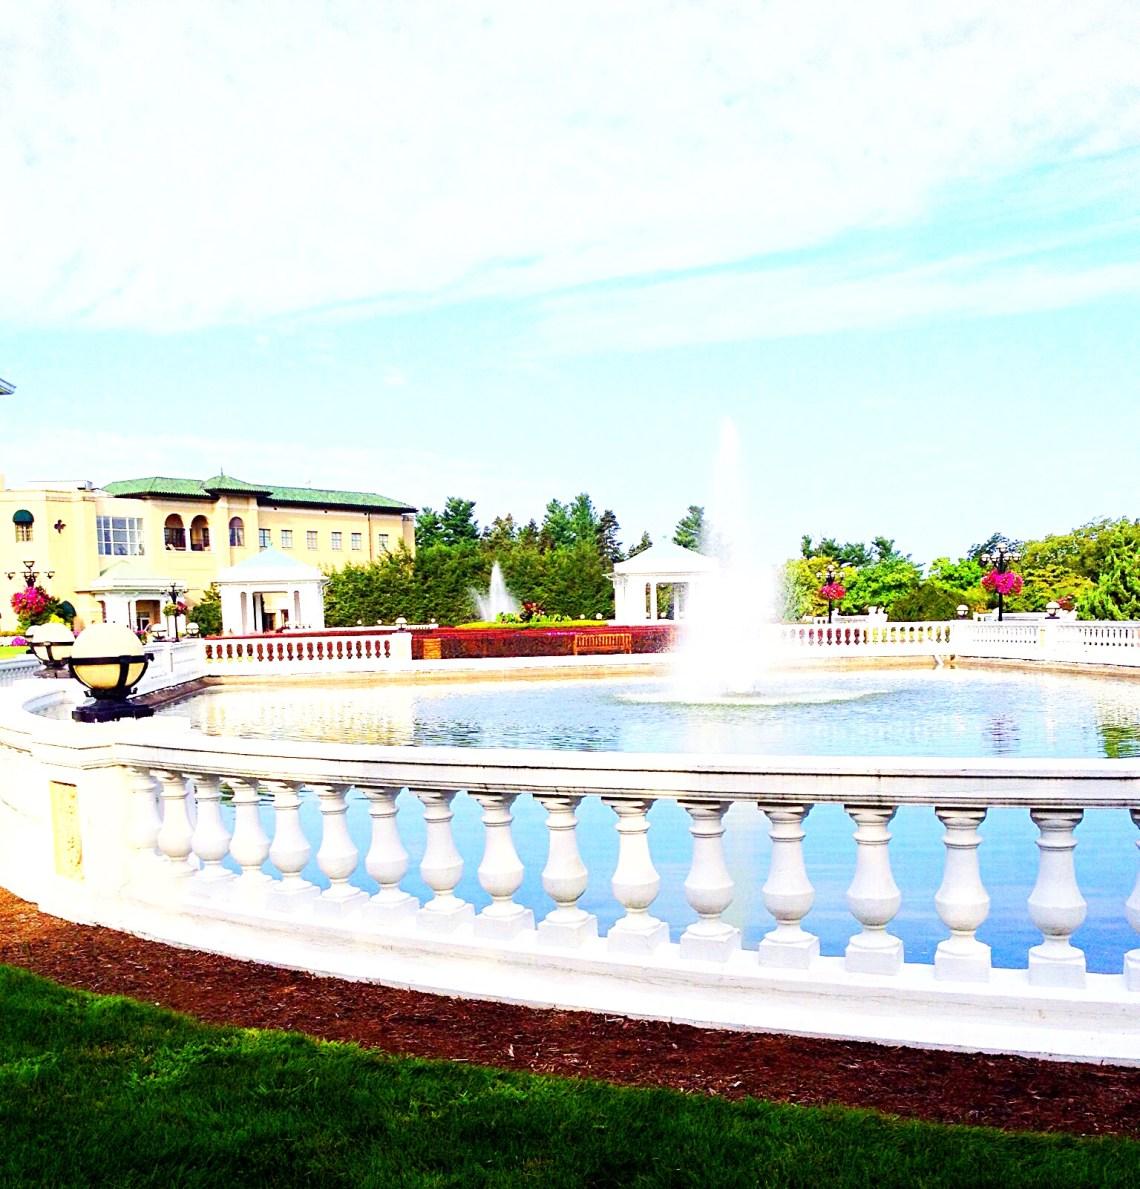 photo of the promenade, west-facing